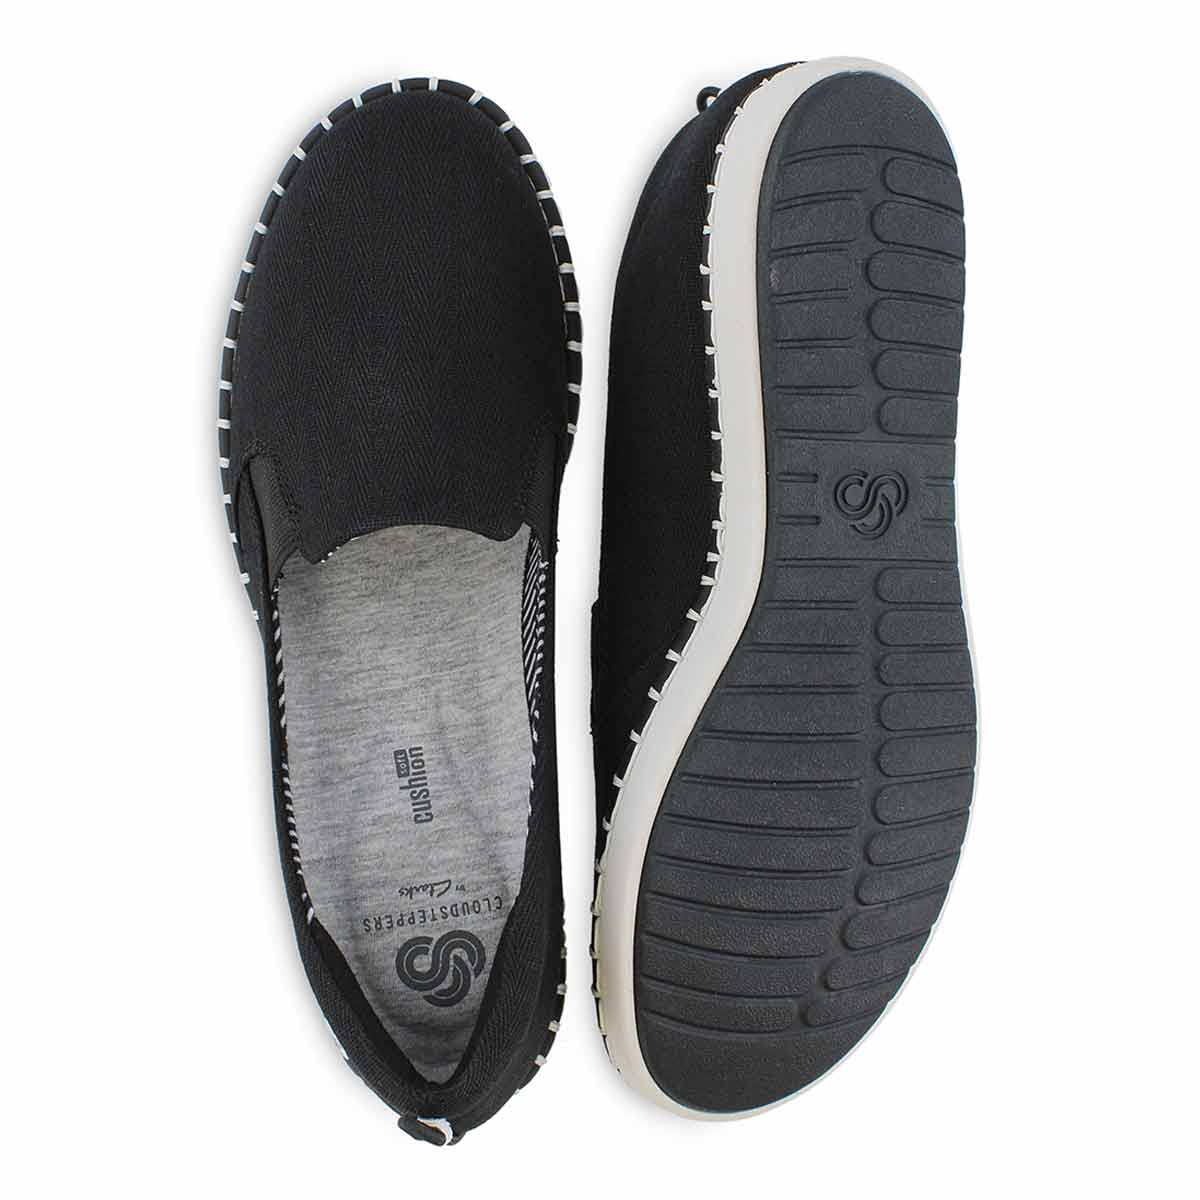 Women's STEP GLOW SLIP black casual loafers